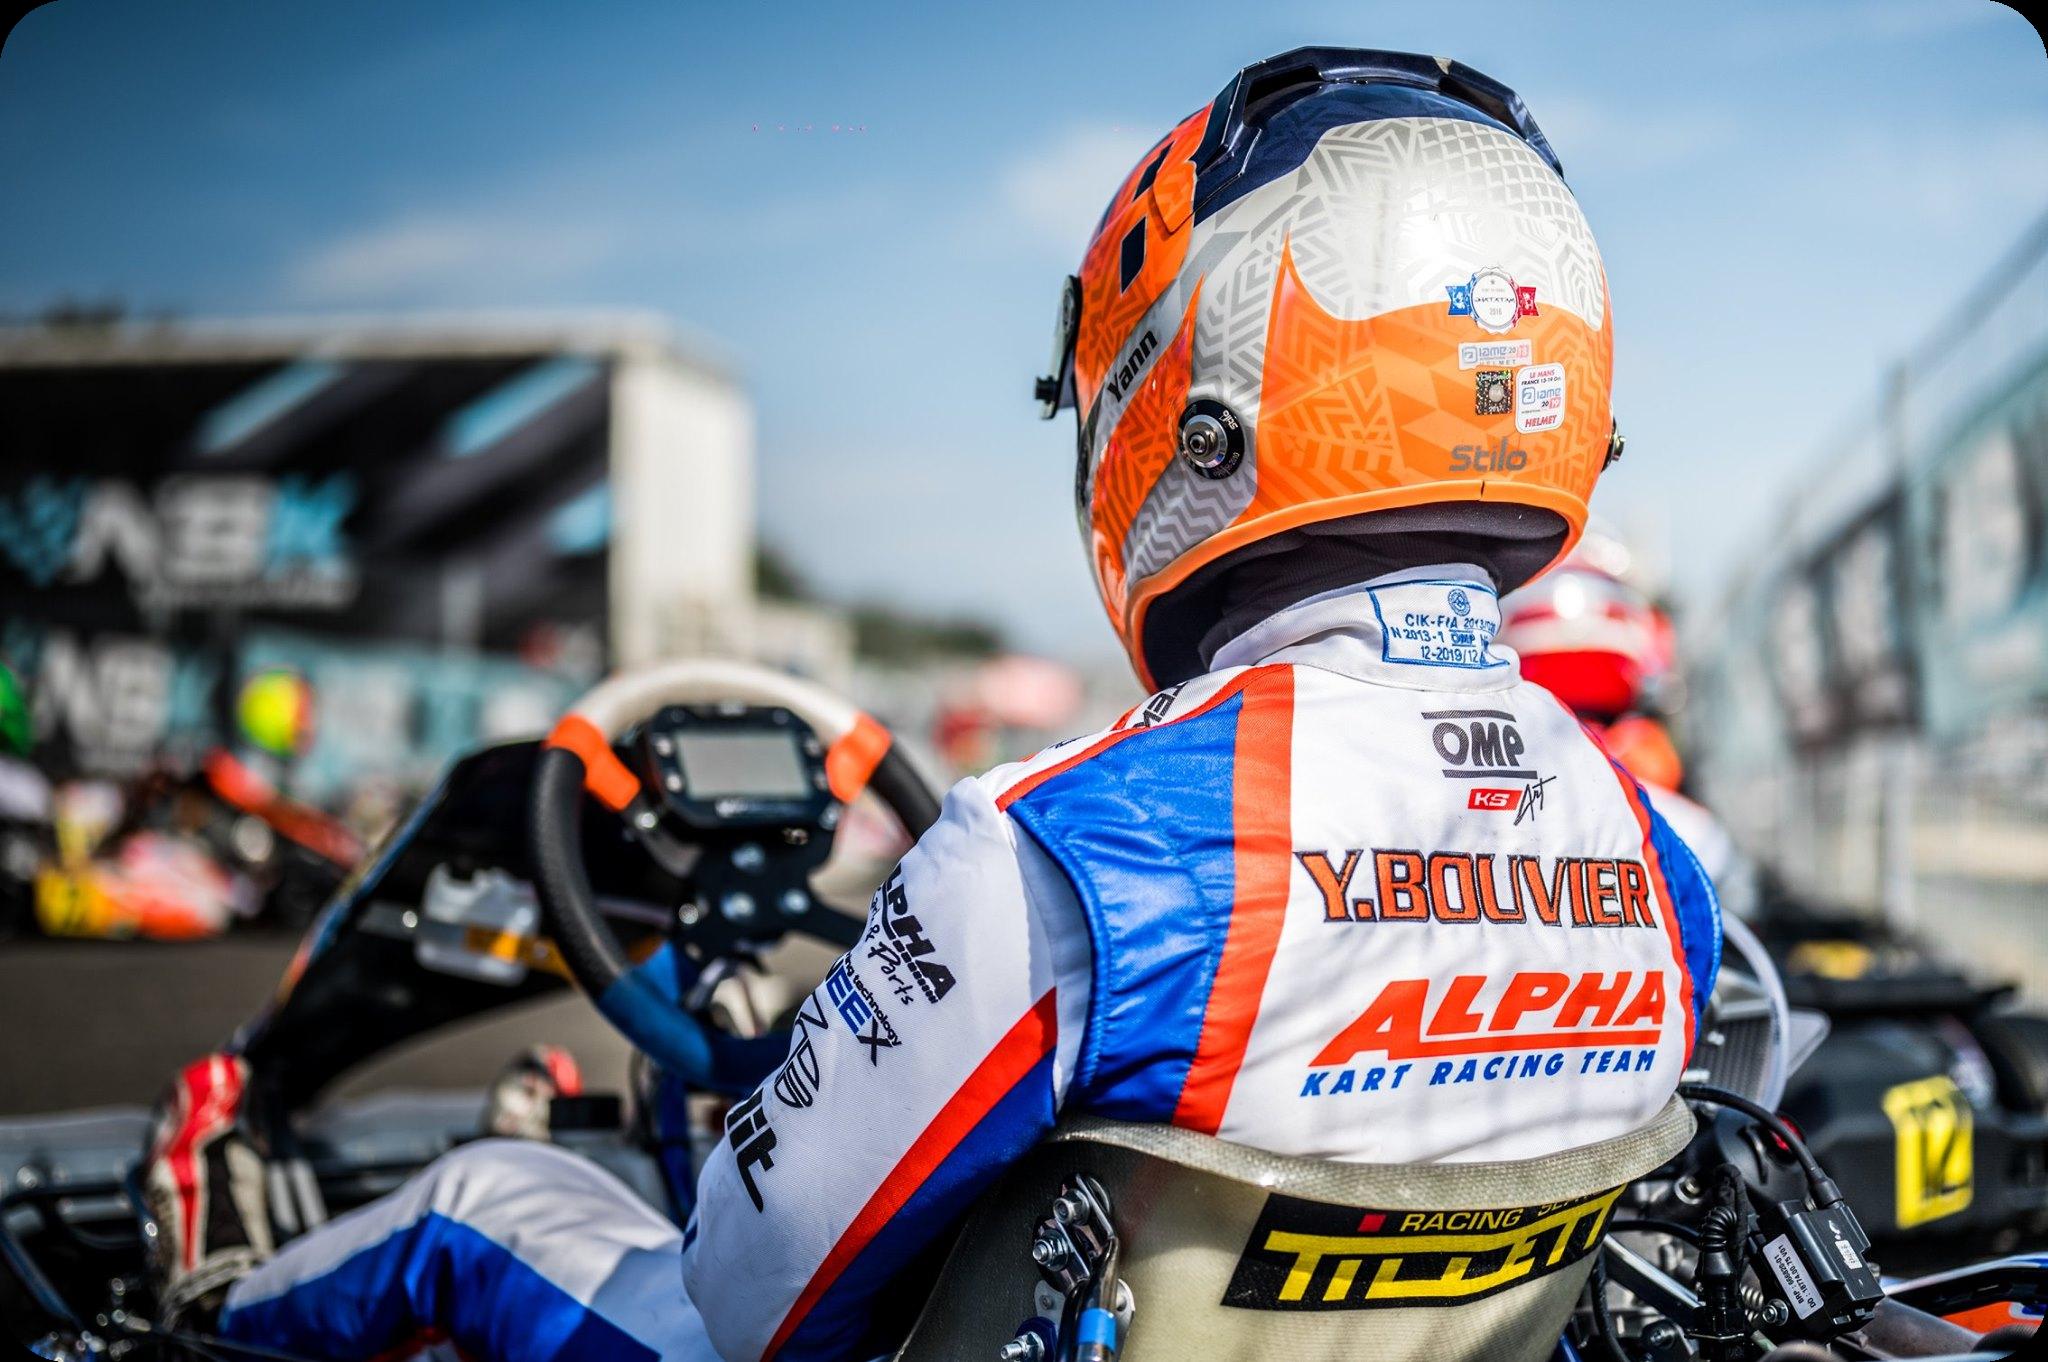 Yann bouvier pilote alpha karting